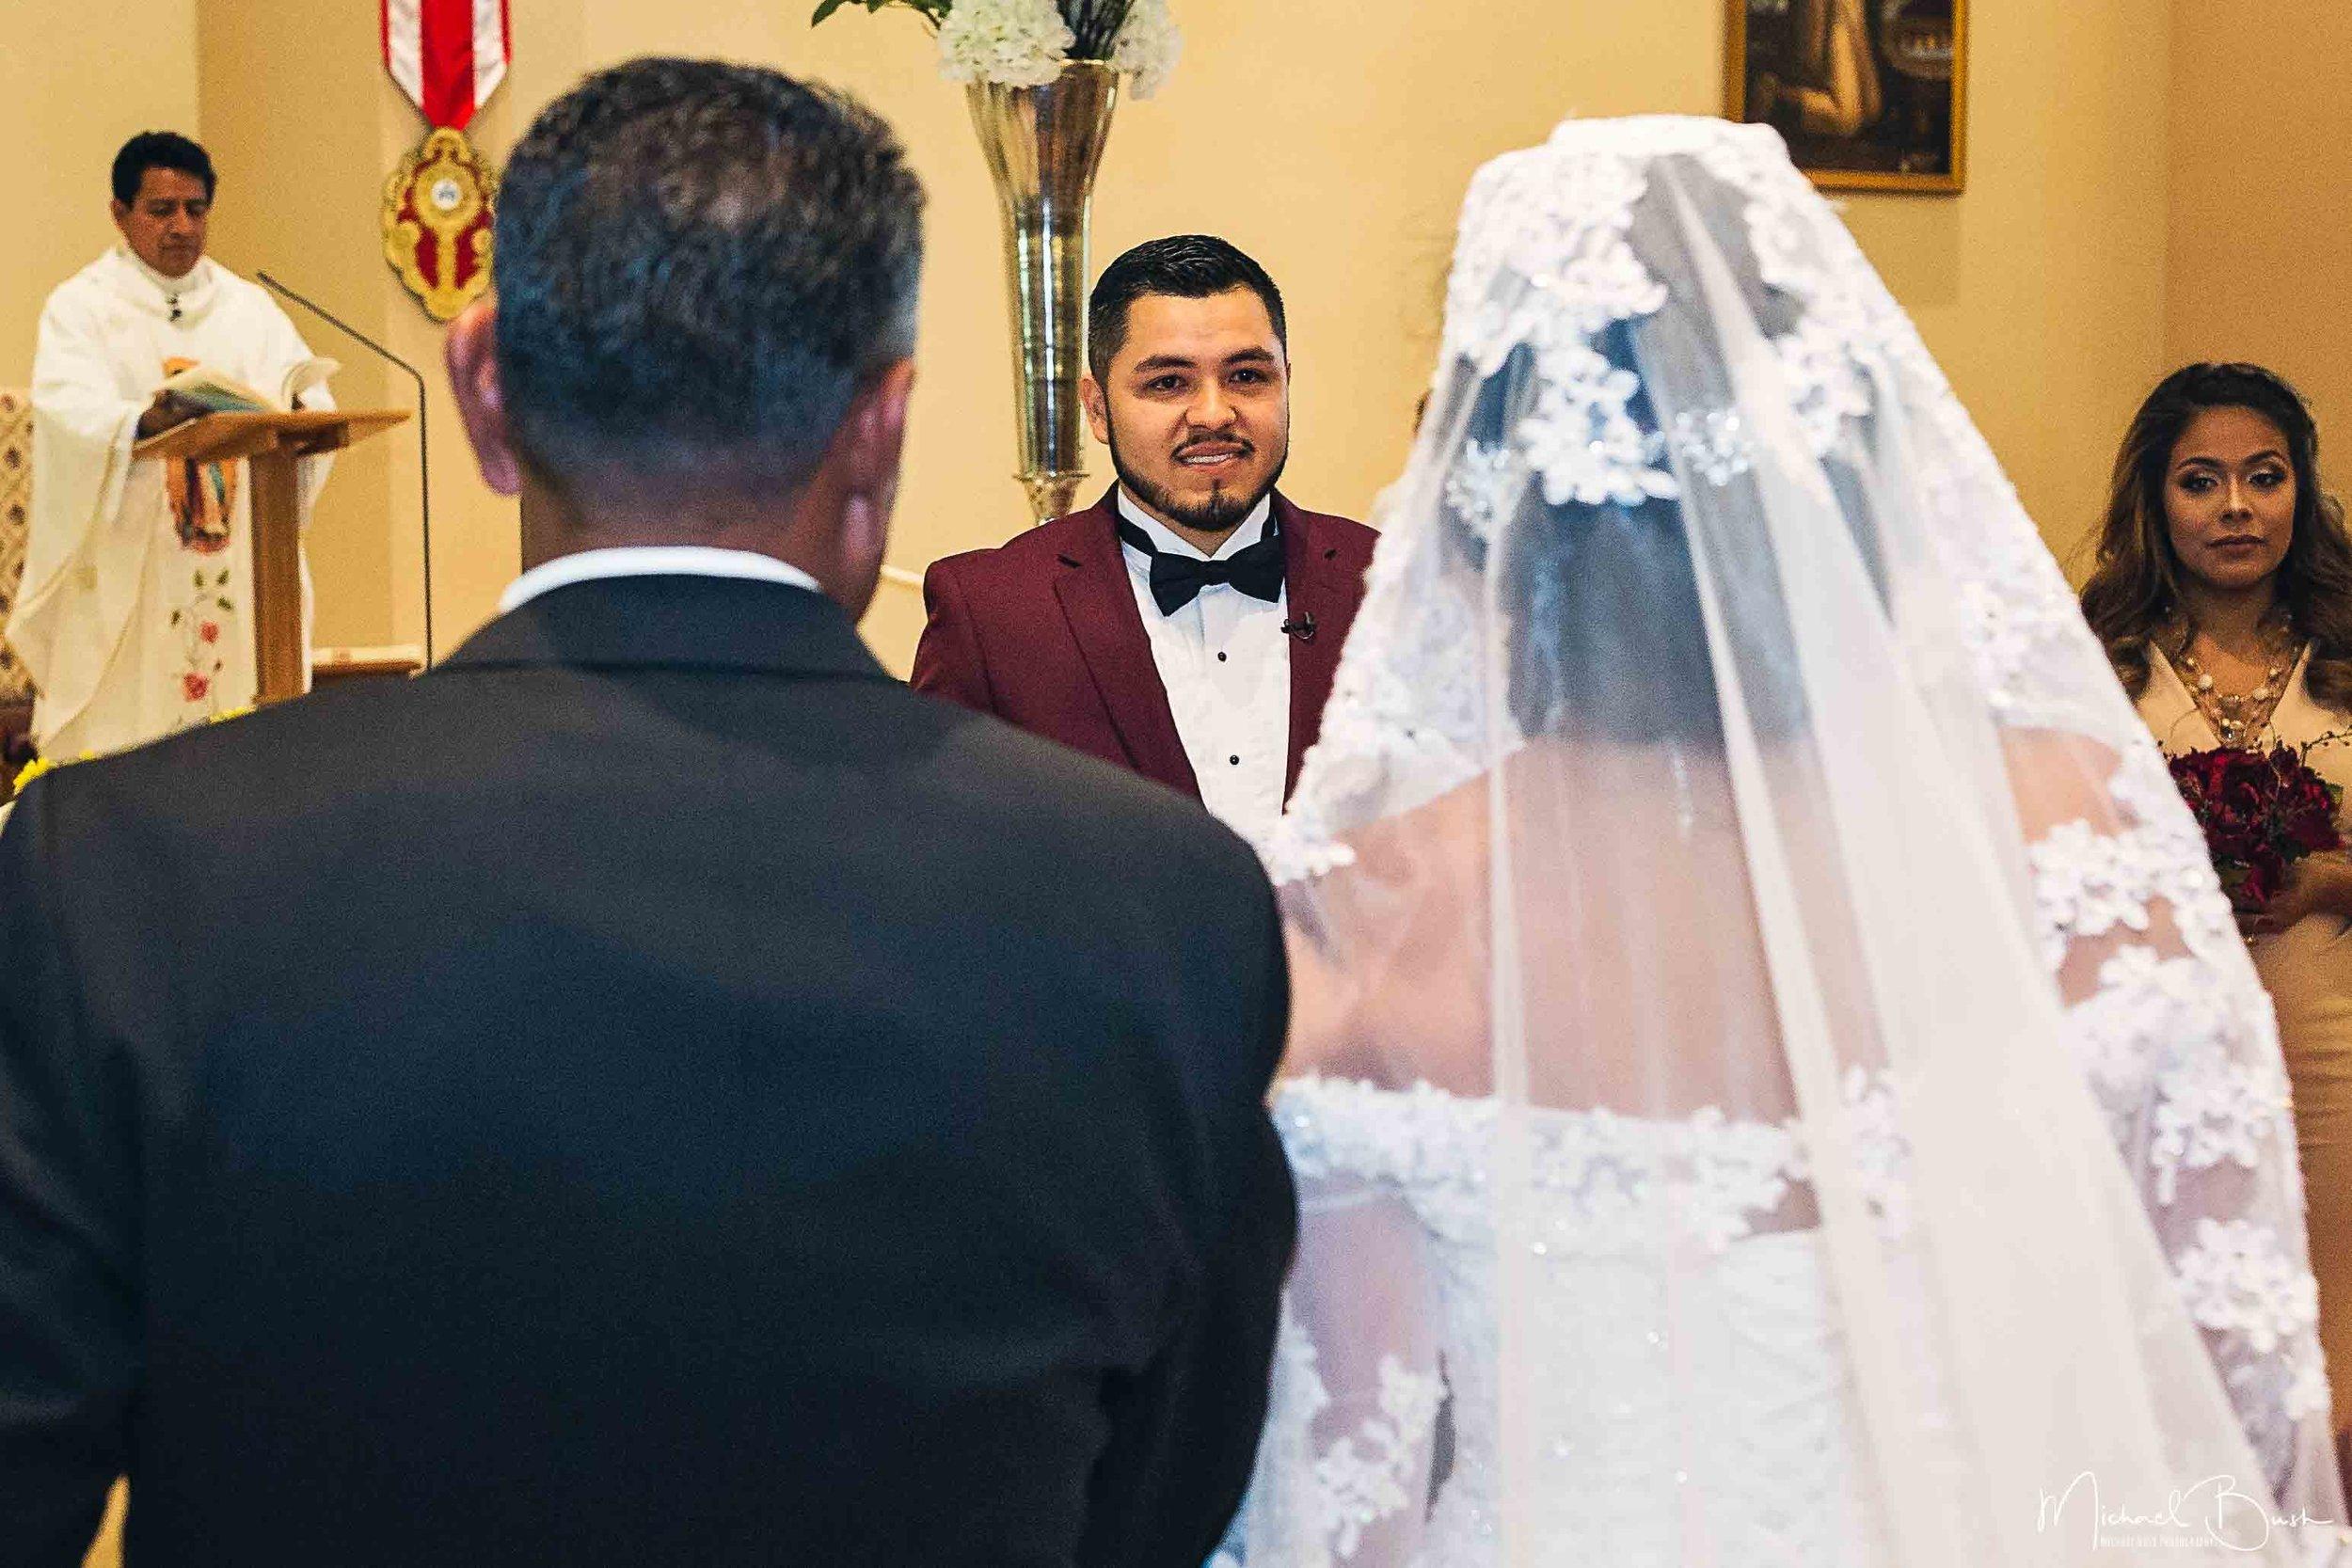 Wedding-Details-Bride-Fort Worth-colors-Ceremony-weddingceremony-brides-groom-firstlook.jpg